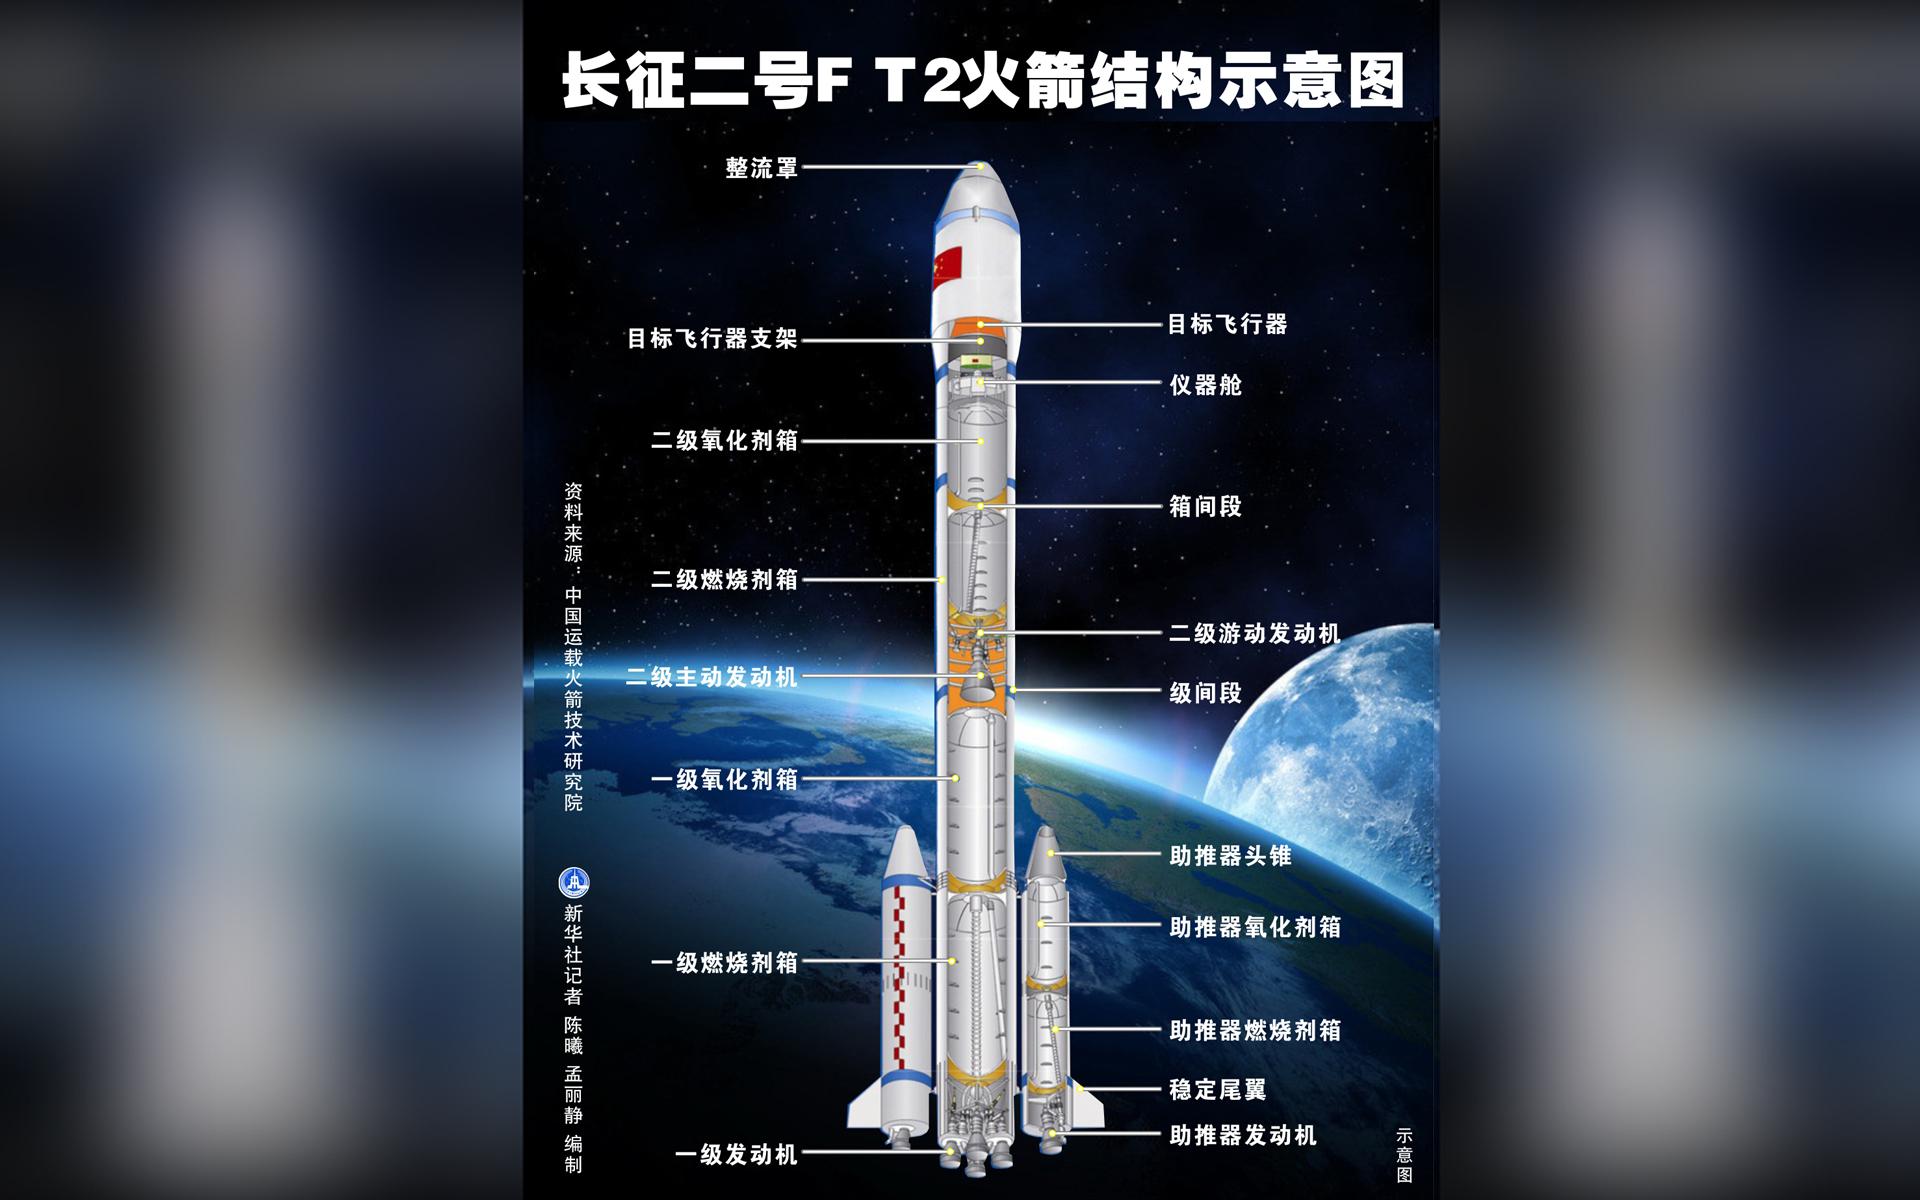 �L征二�F T2火箭�Y��示意�D